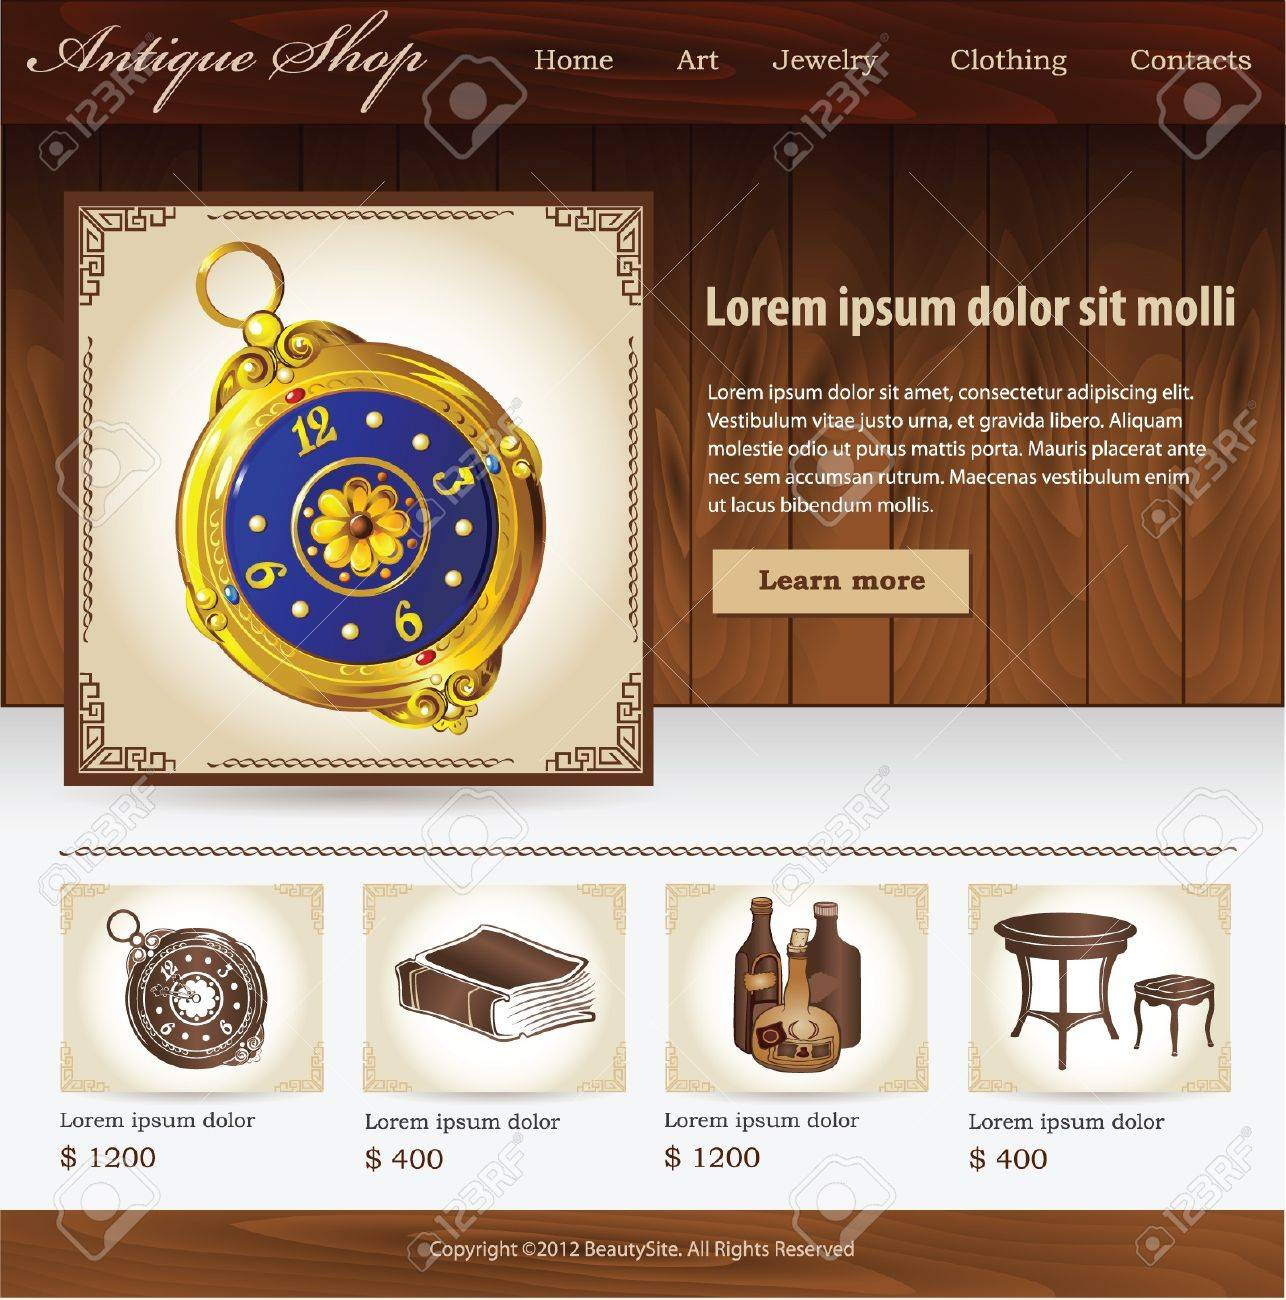 Design Template For Antique Shop Website